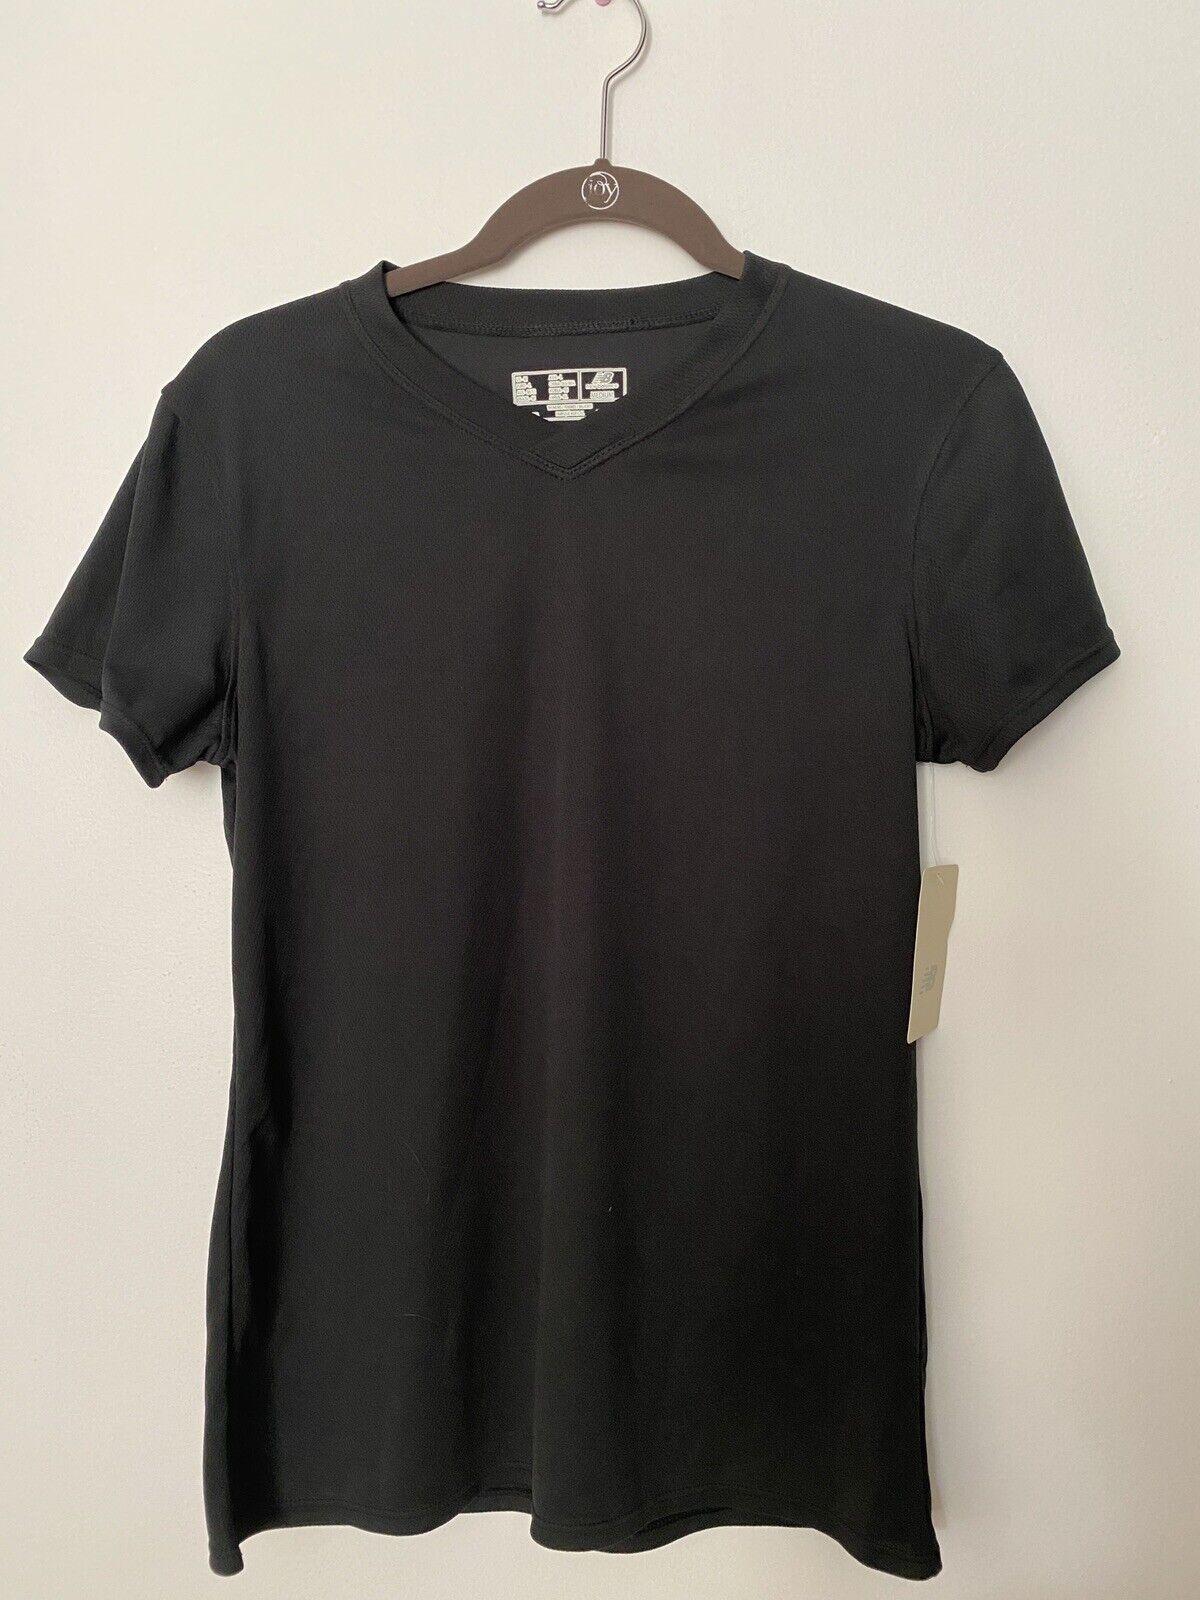 NEW BALANCE Short Sleeve Black Activewear Running Shirt Top Womens Medium